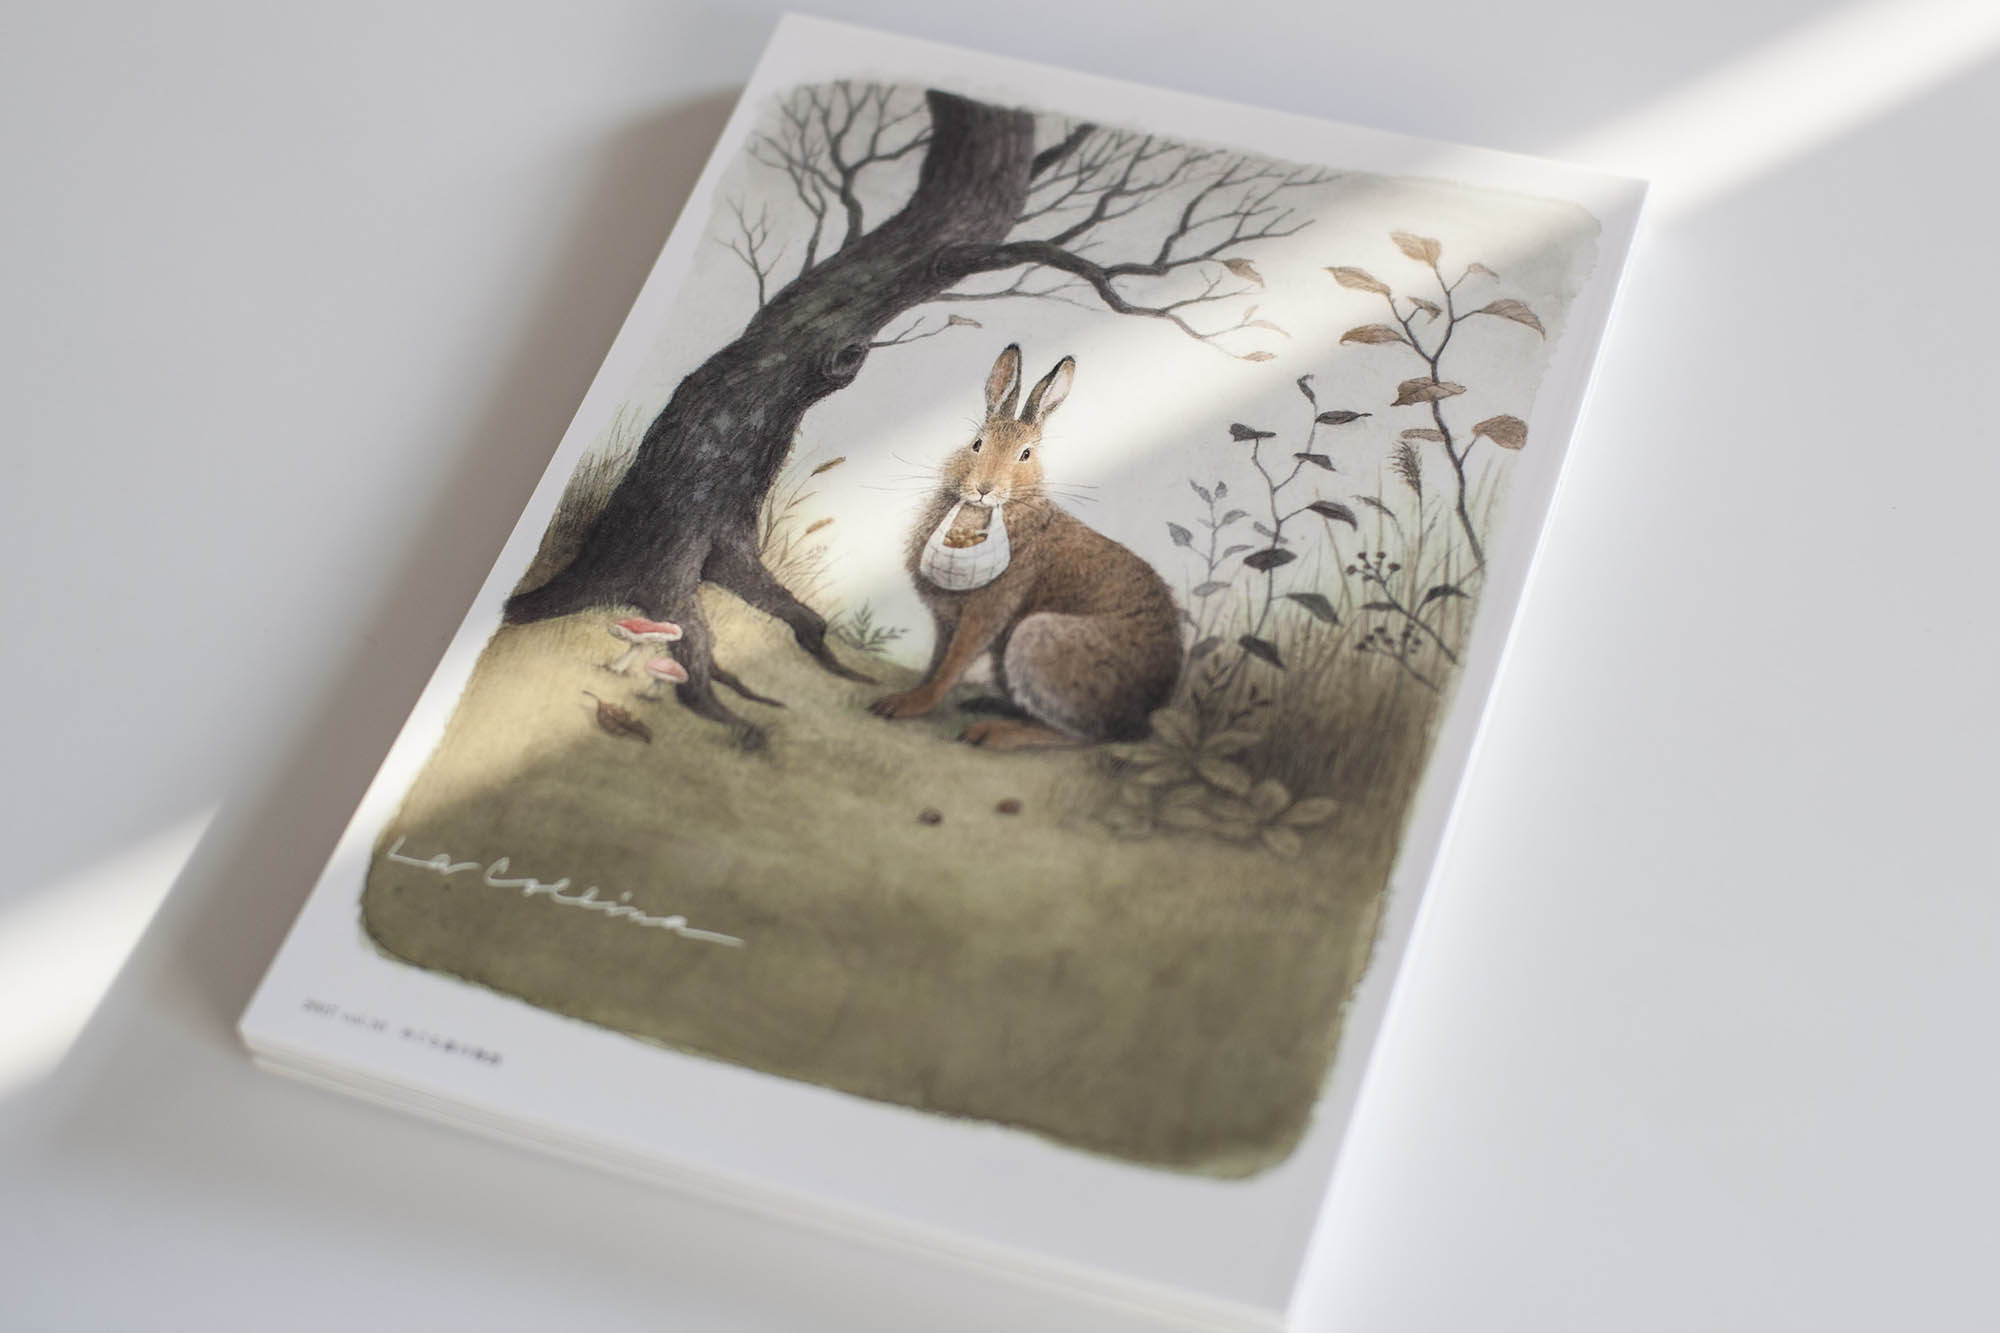 La Collina vol.10 めぐる森の物語